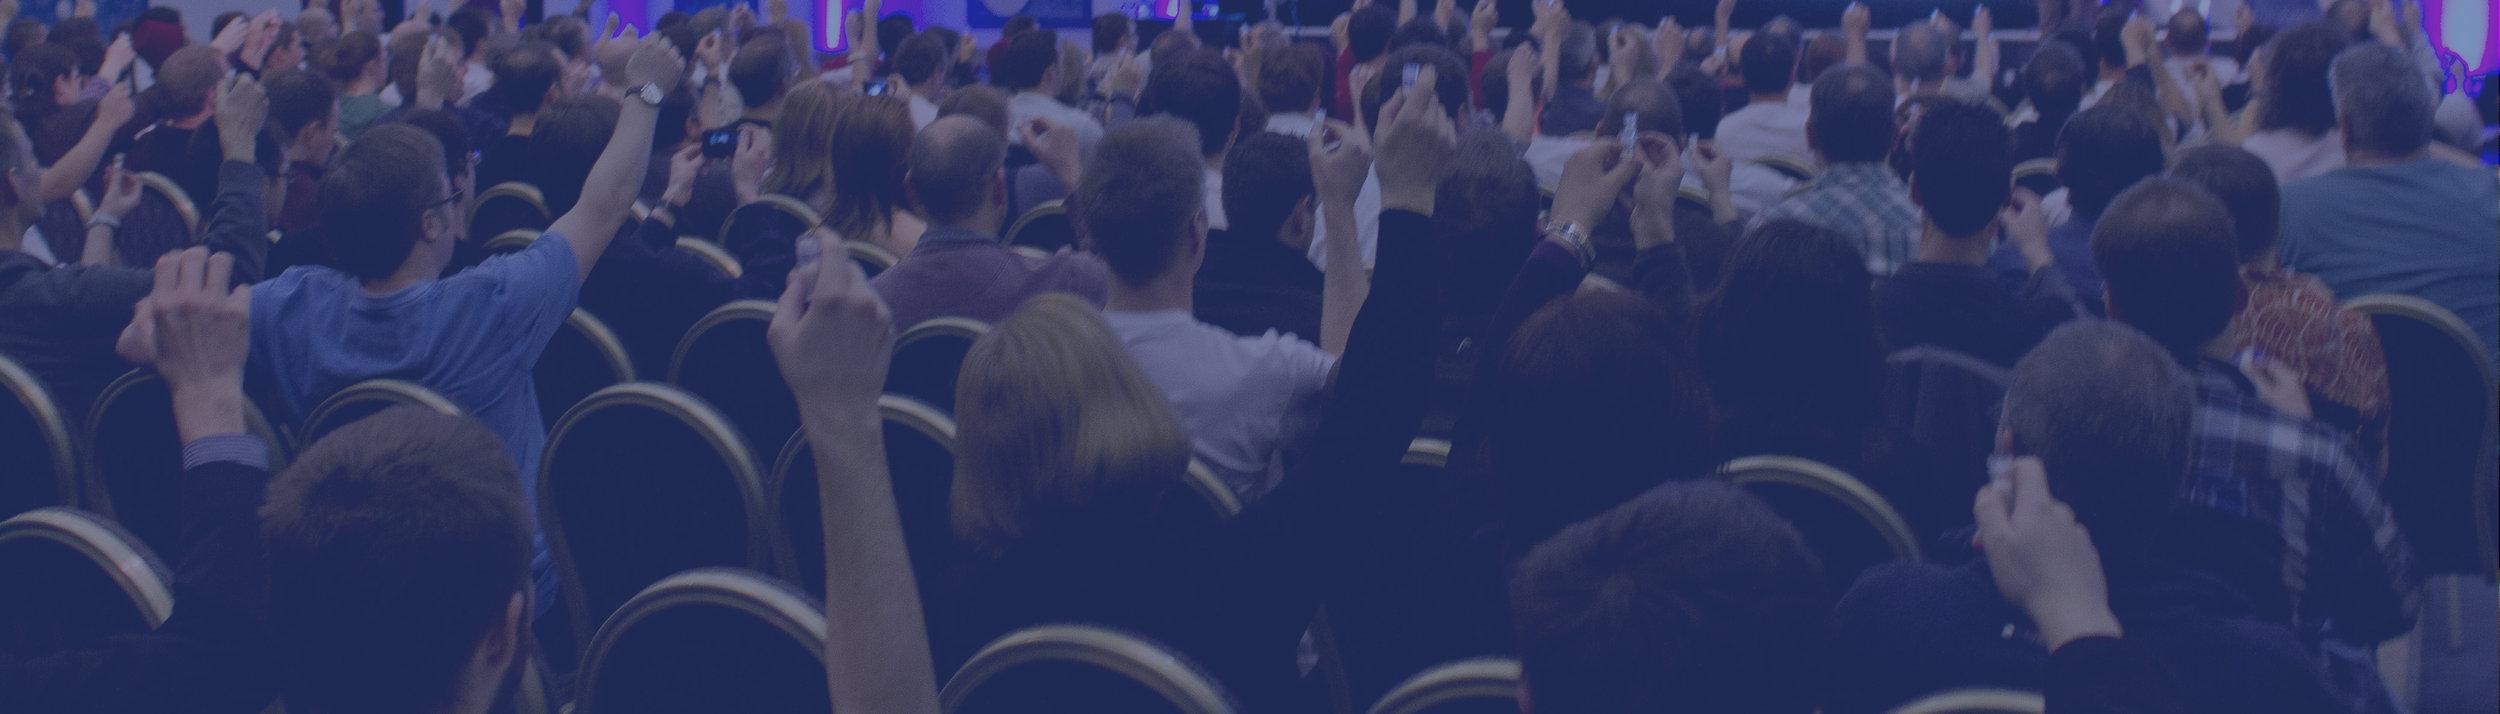 blue-conference.jpg